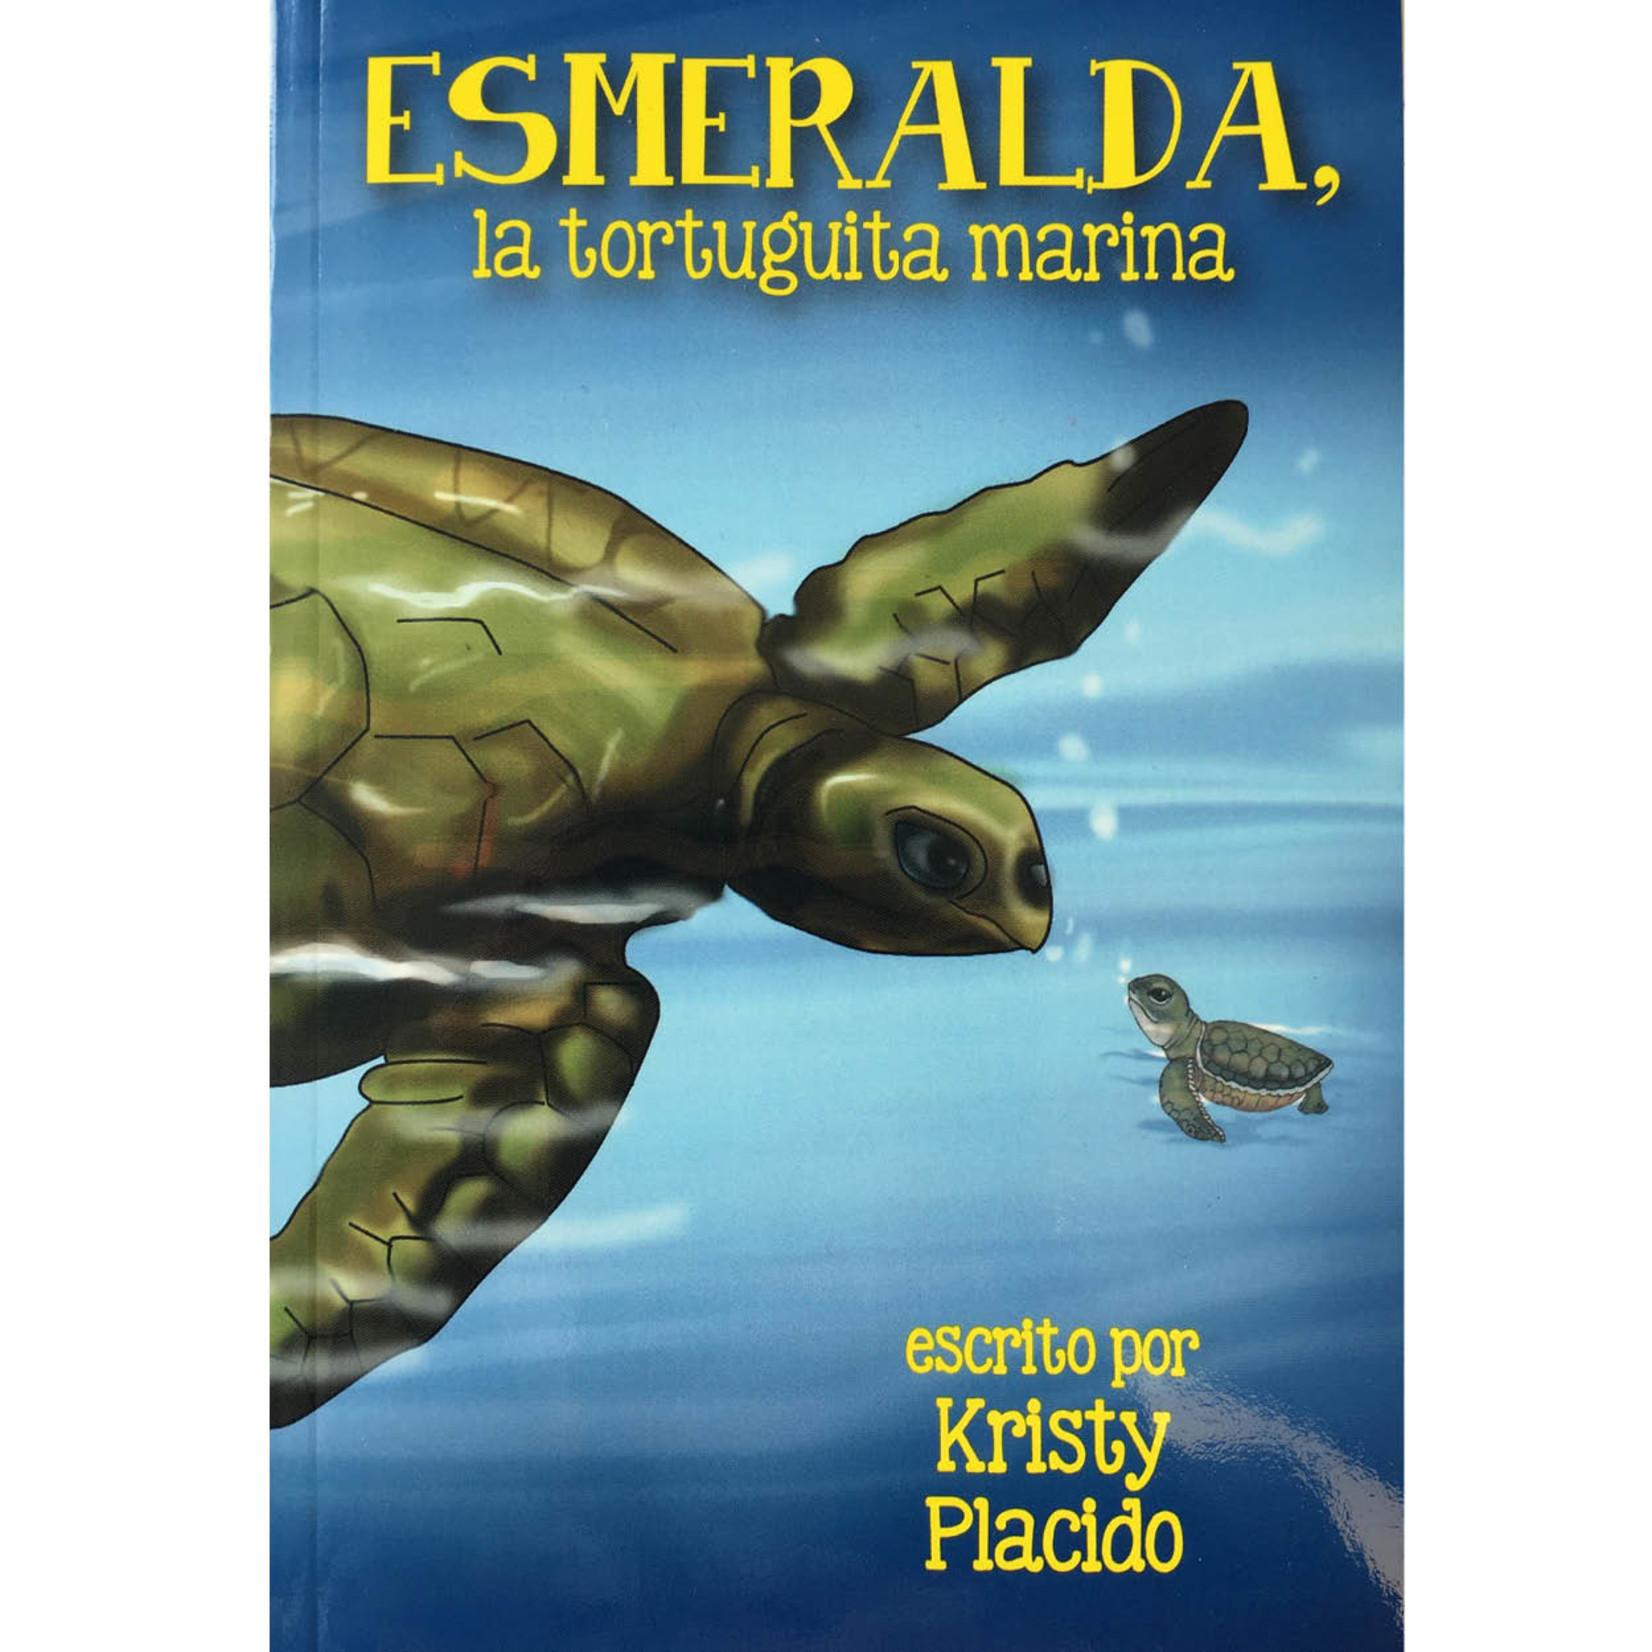 Fluency Matters Esmeralda, la tortuiguita marina